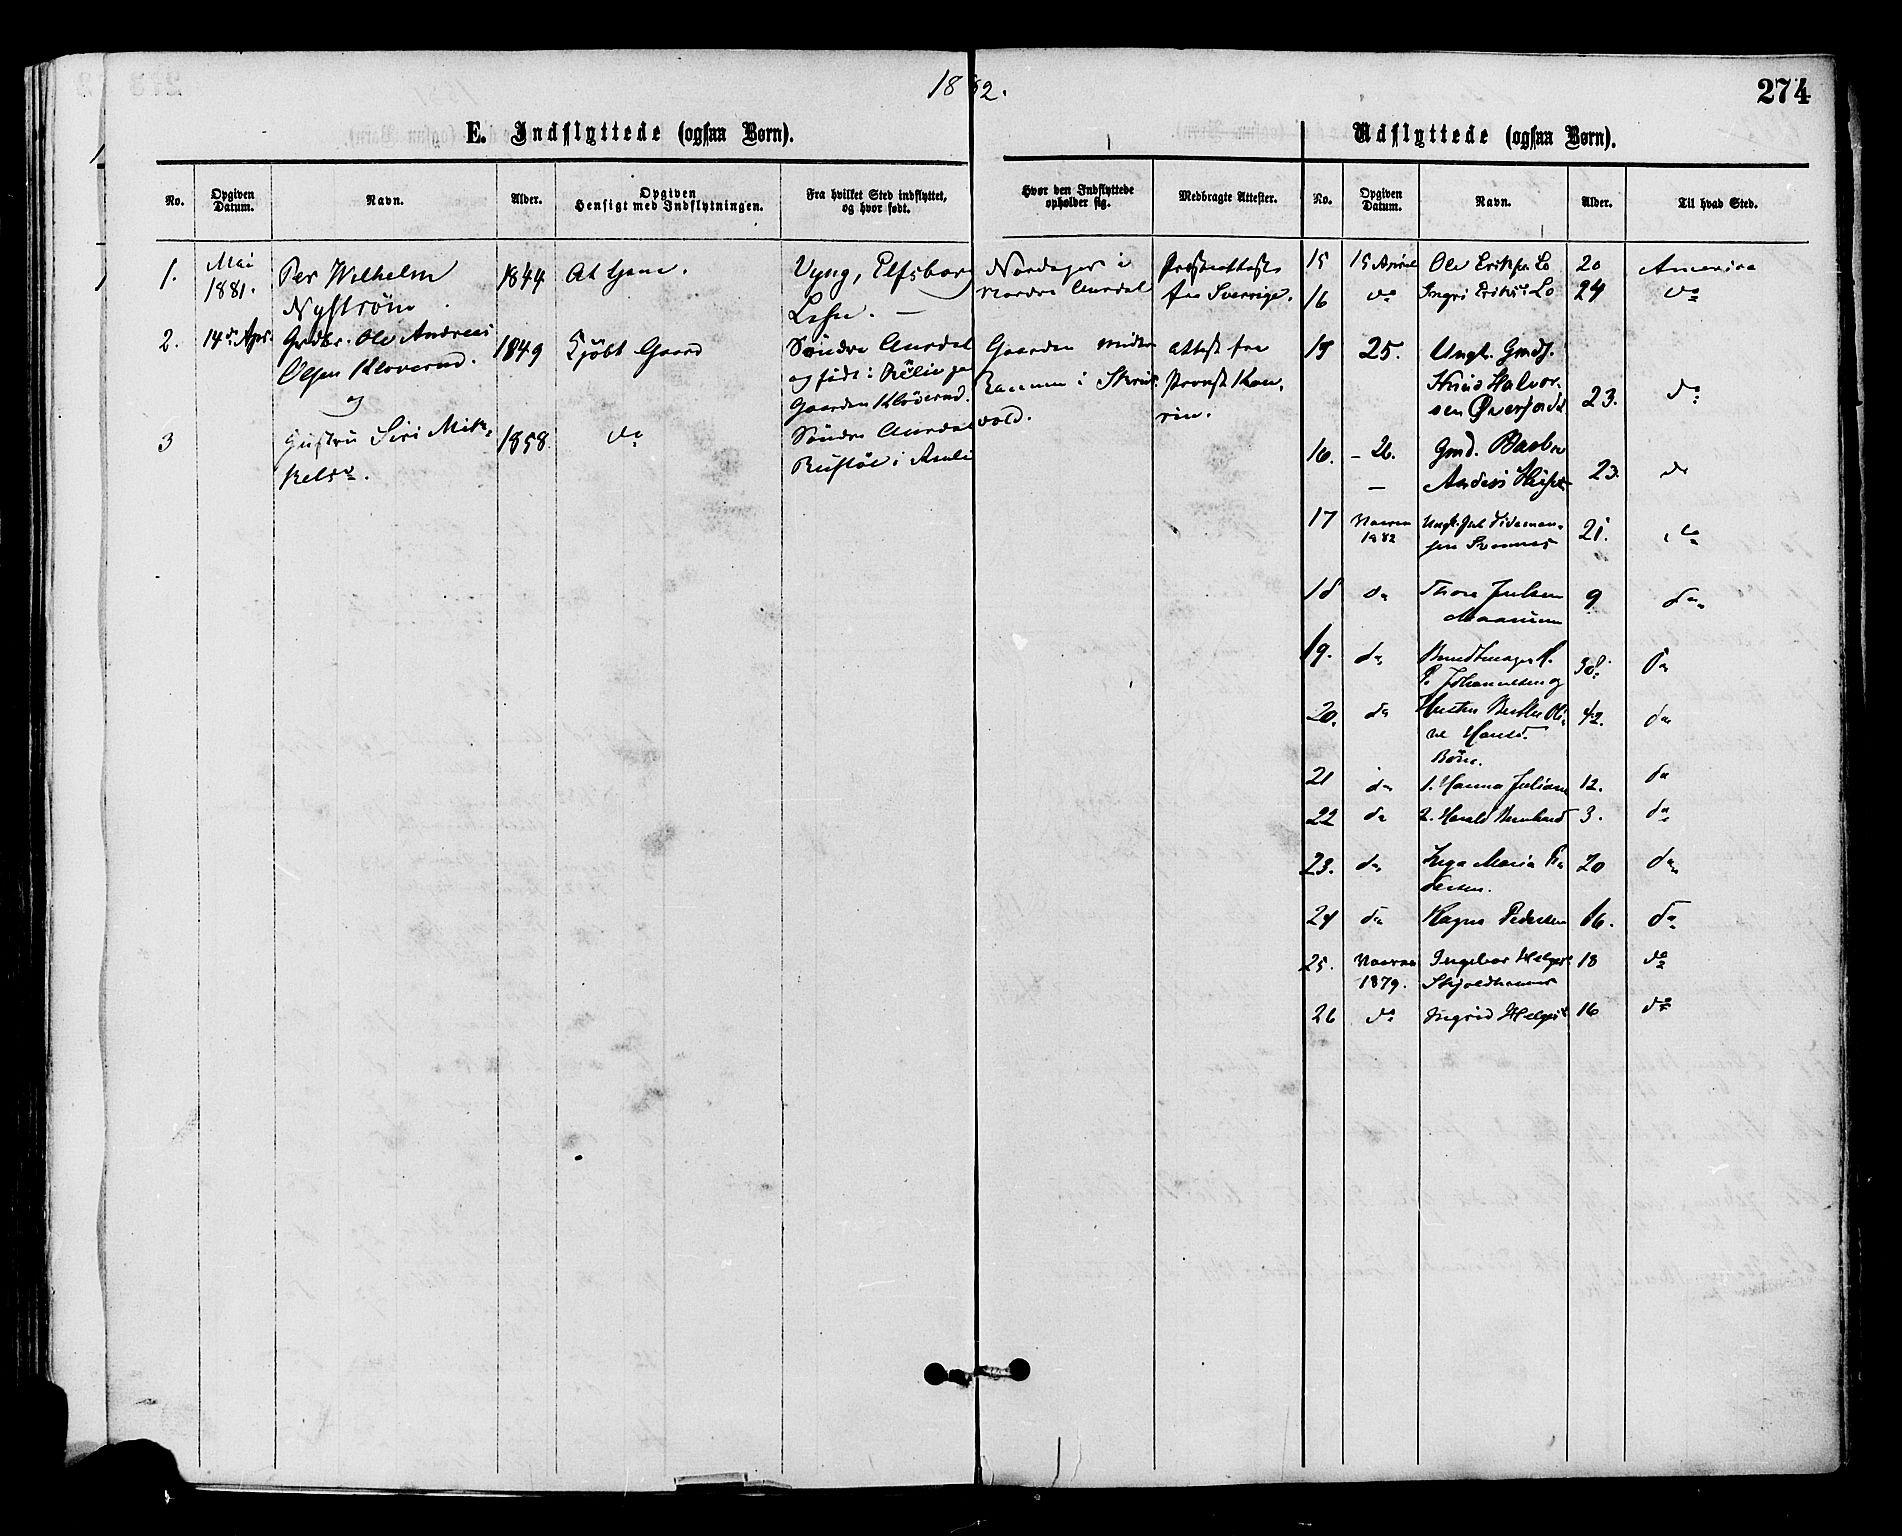 SAH, Nord-Aurdal prestekontor, Ministerialbok nr. 9, 1876-1882, s. 274